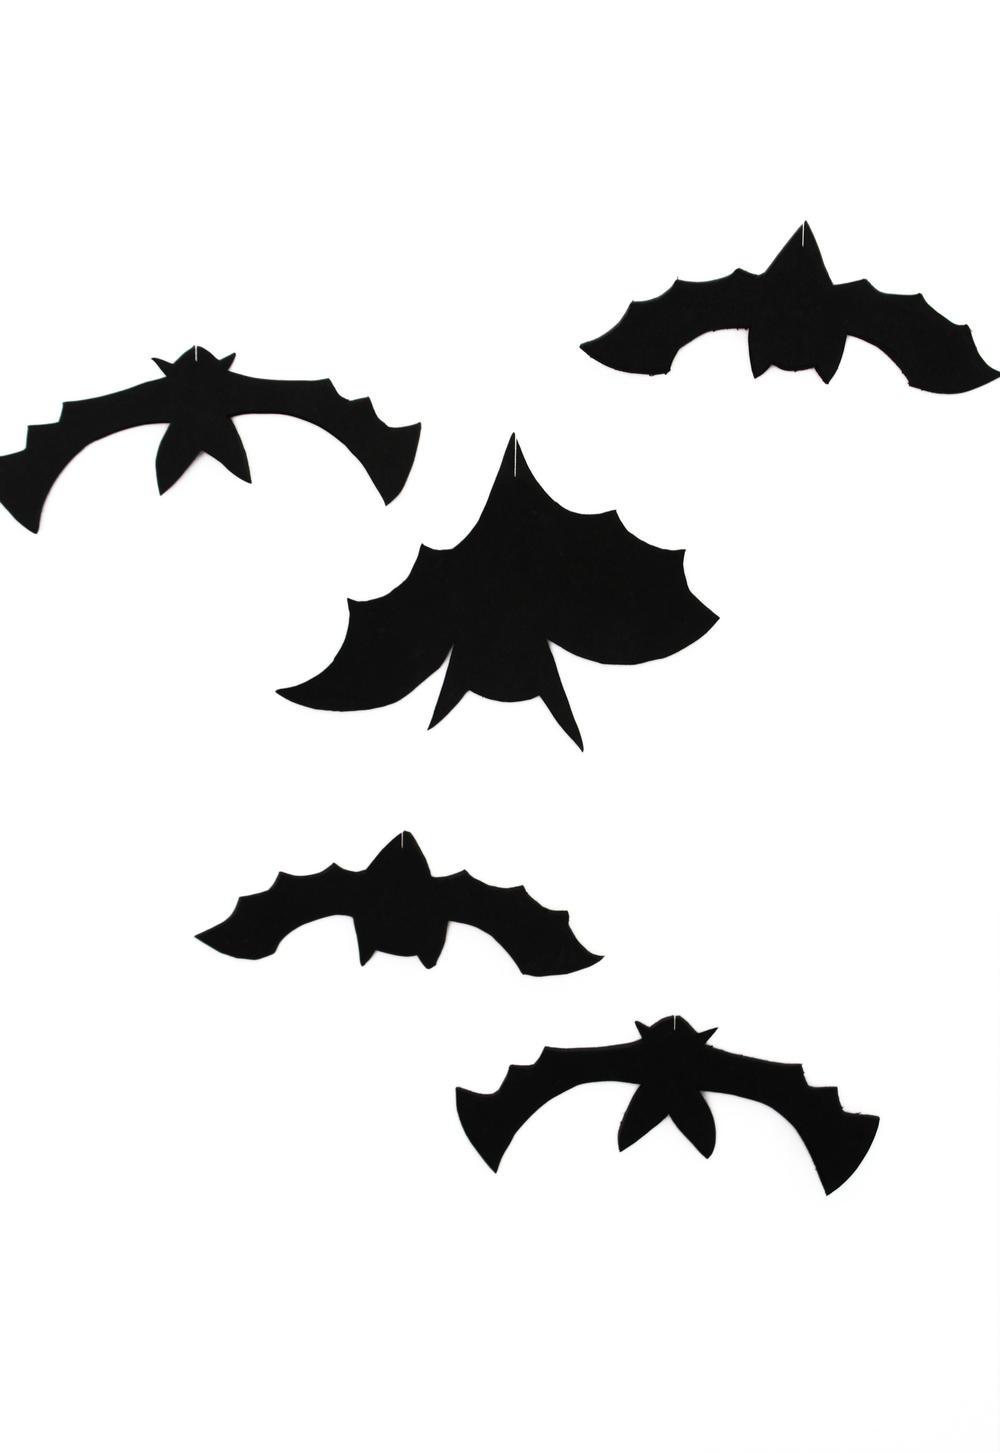 hanging bats halloween decorations | allfreeholidaycrafts